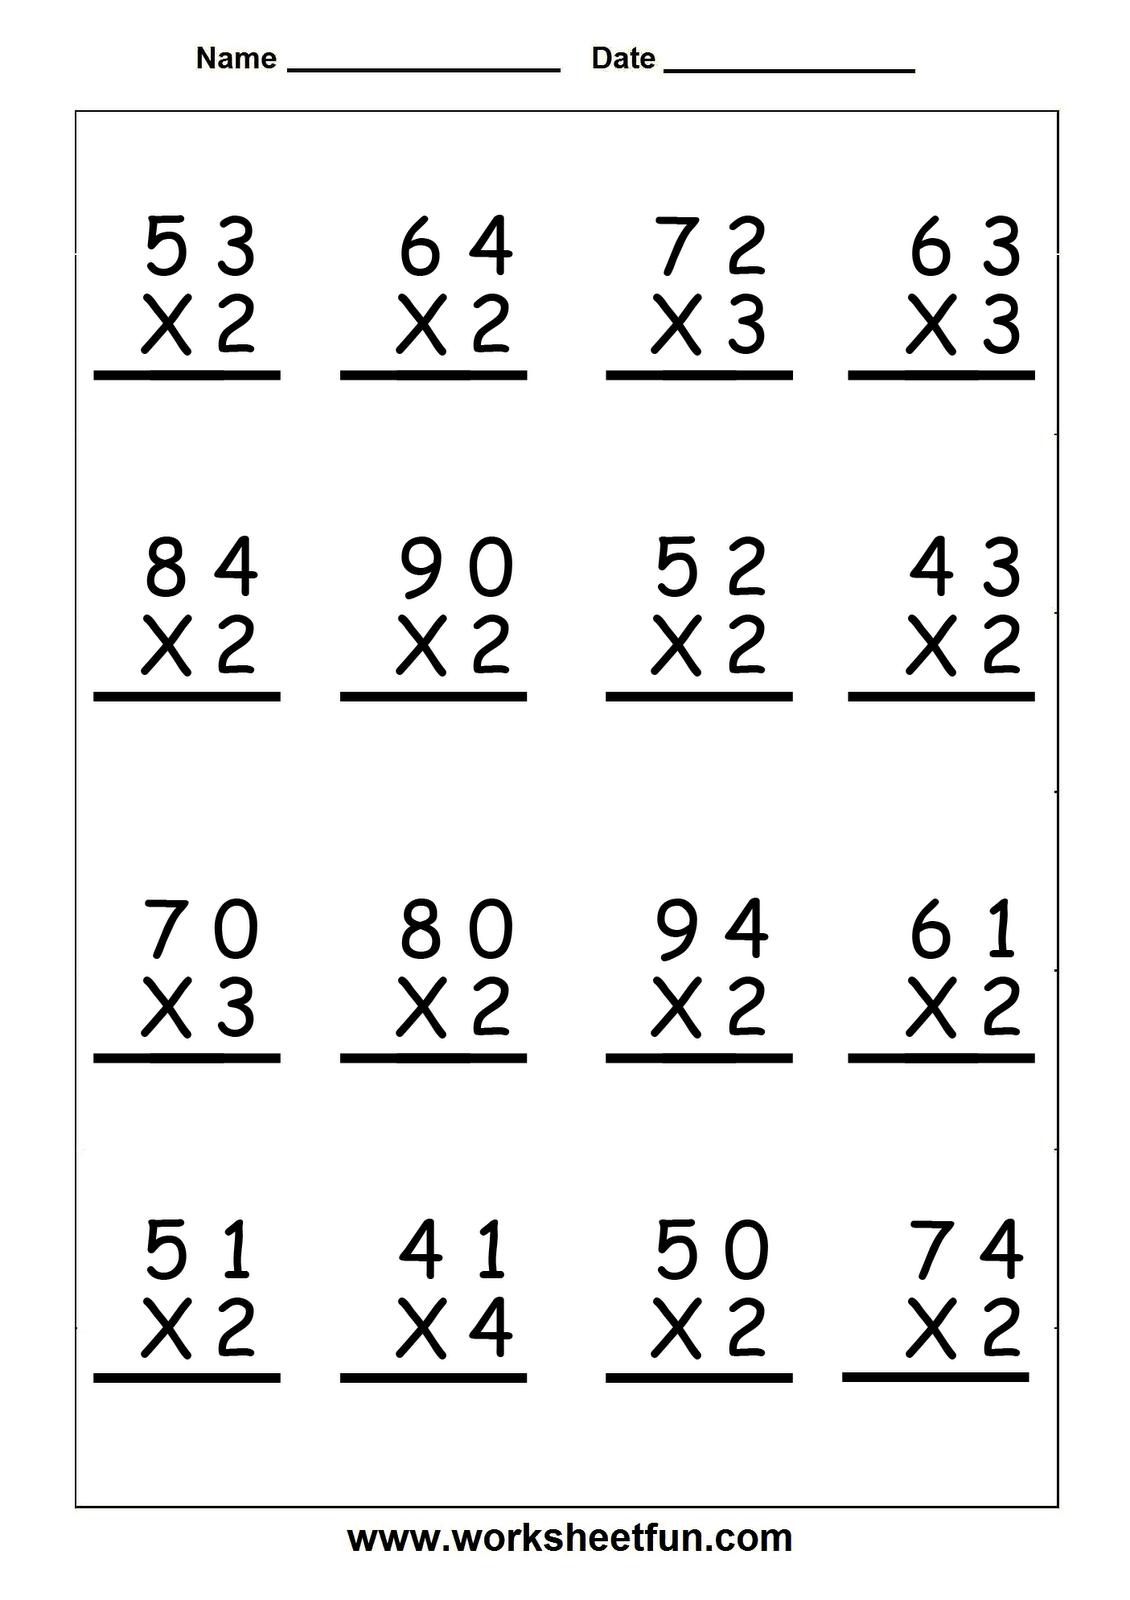 multiplication worksheets grade 5 - Google Search   Math fact worksheets [ 1600 x 1130 Pixel ]